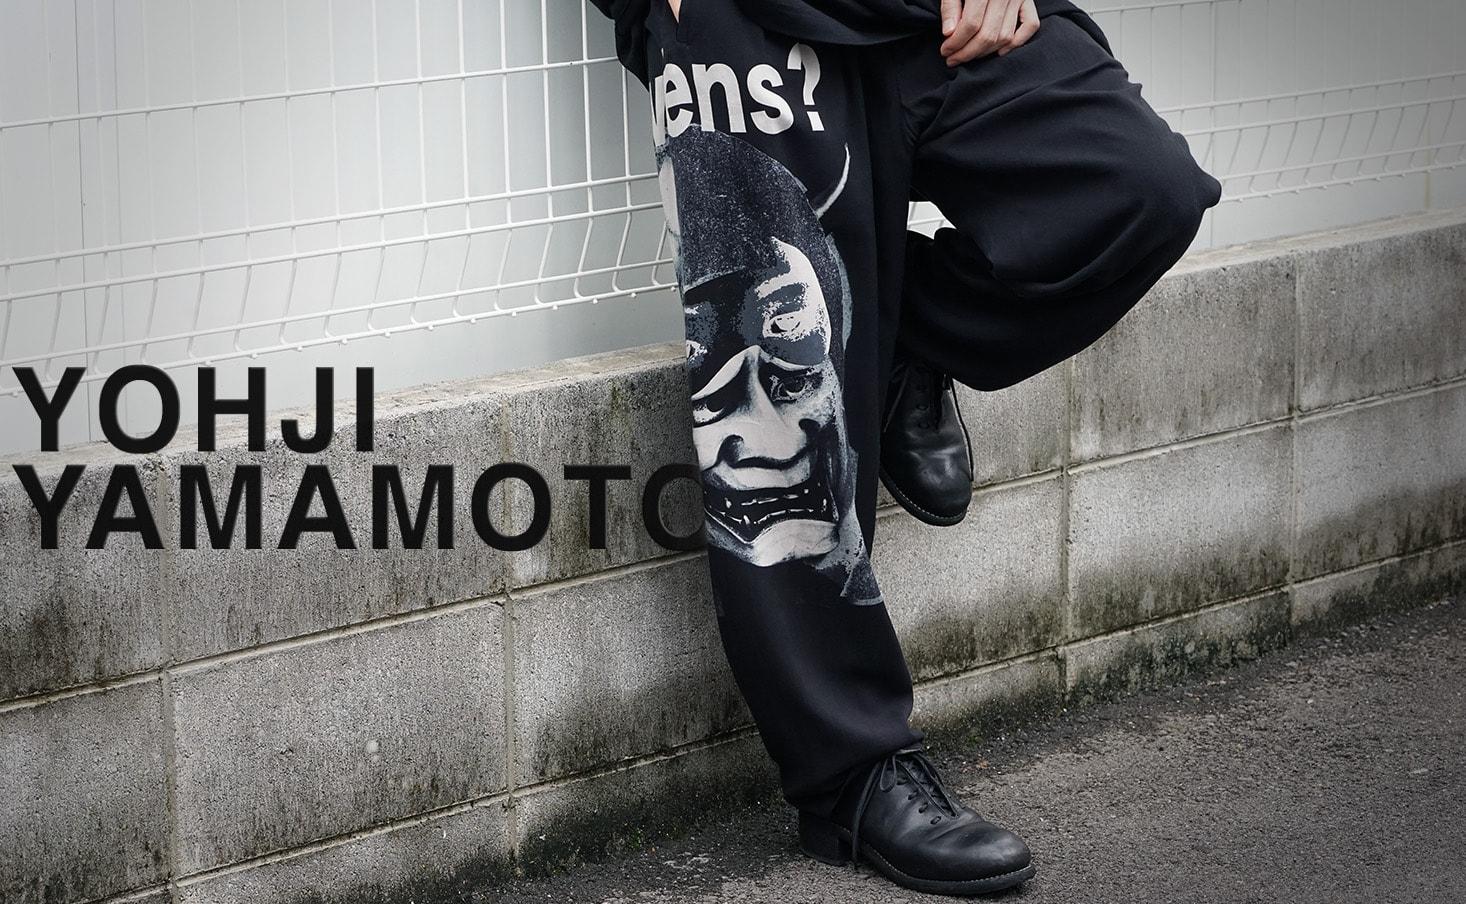 yohji yamamoto 18-19AW